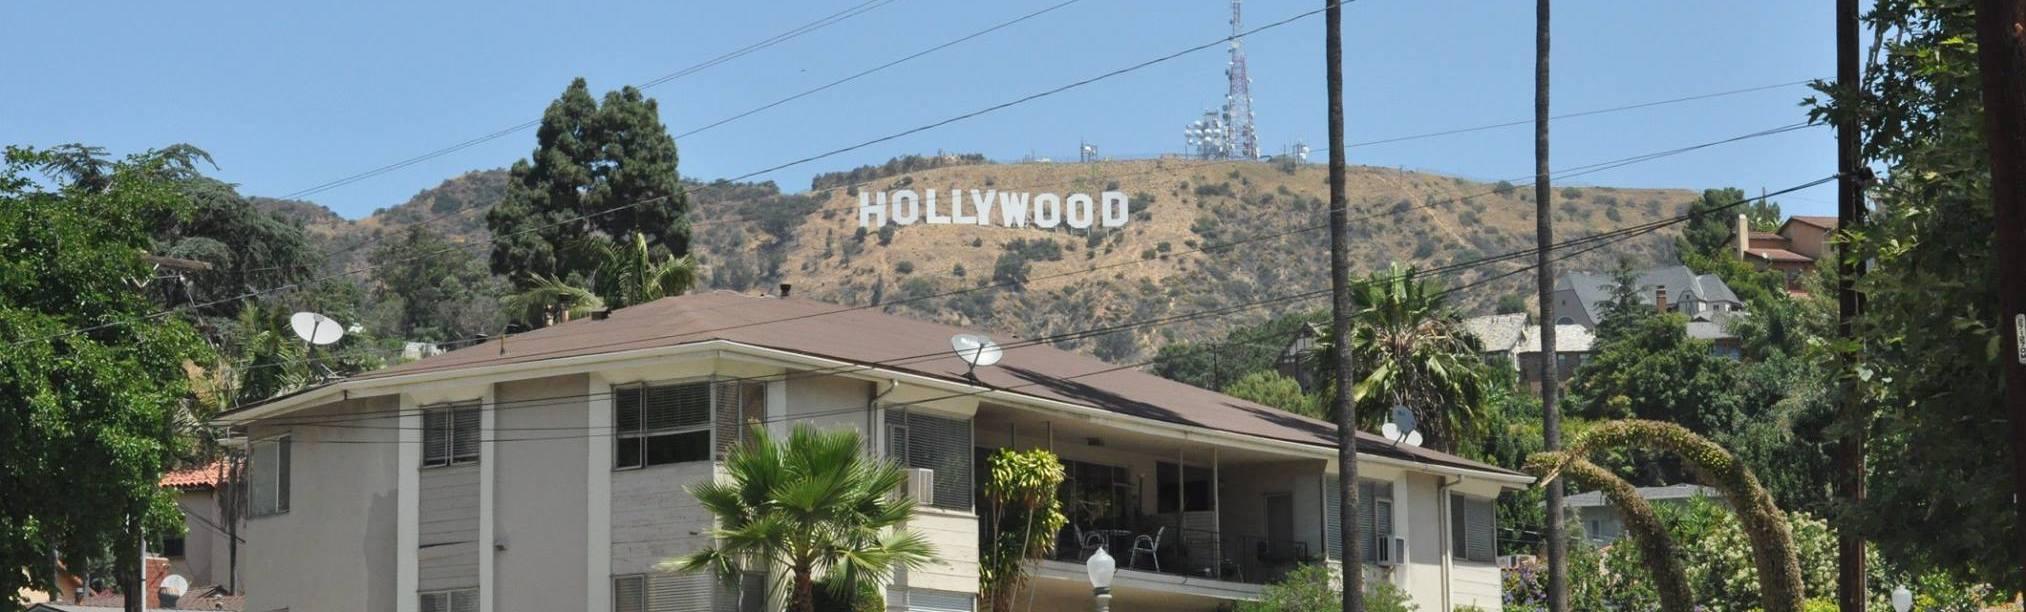 hollywood-LA